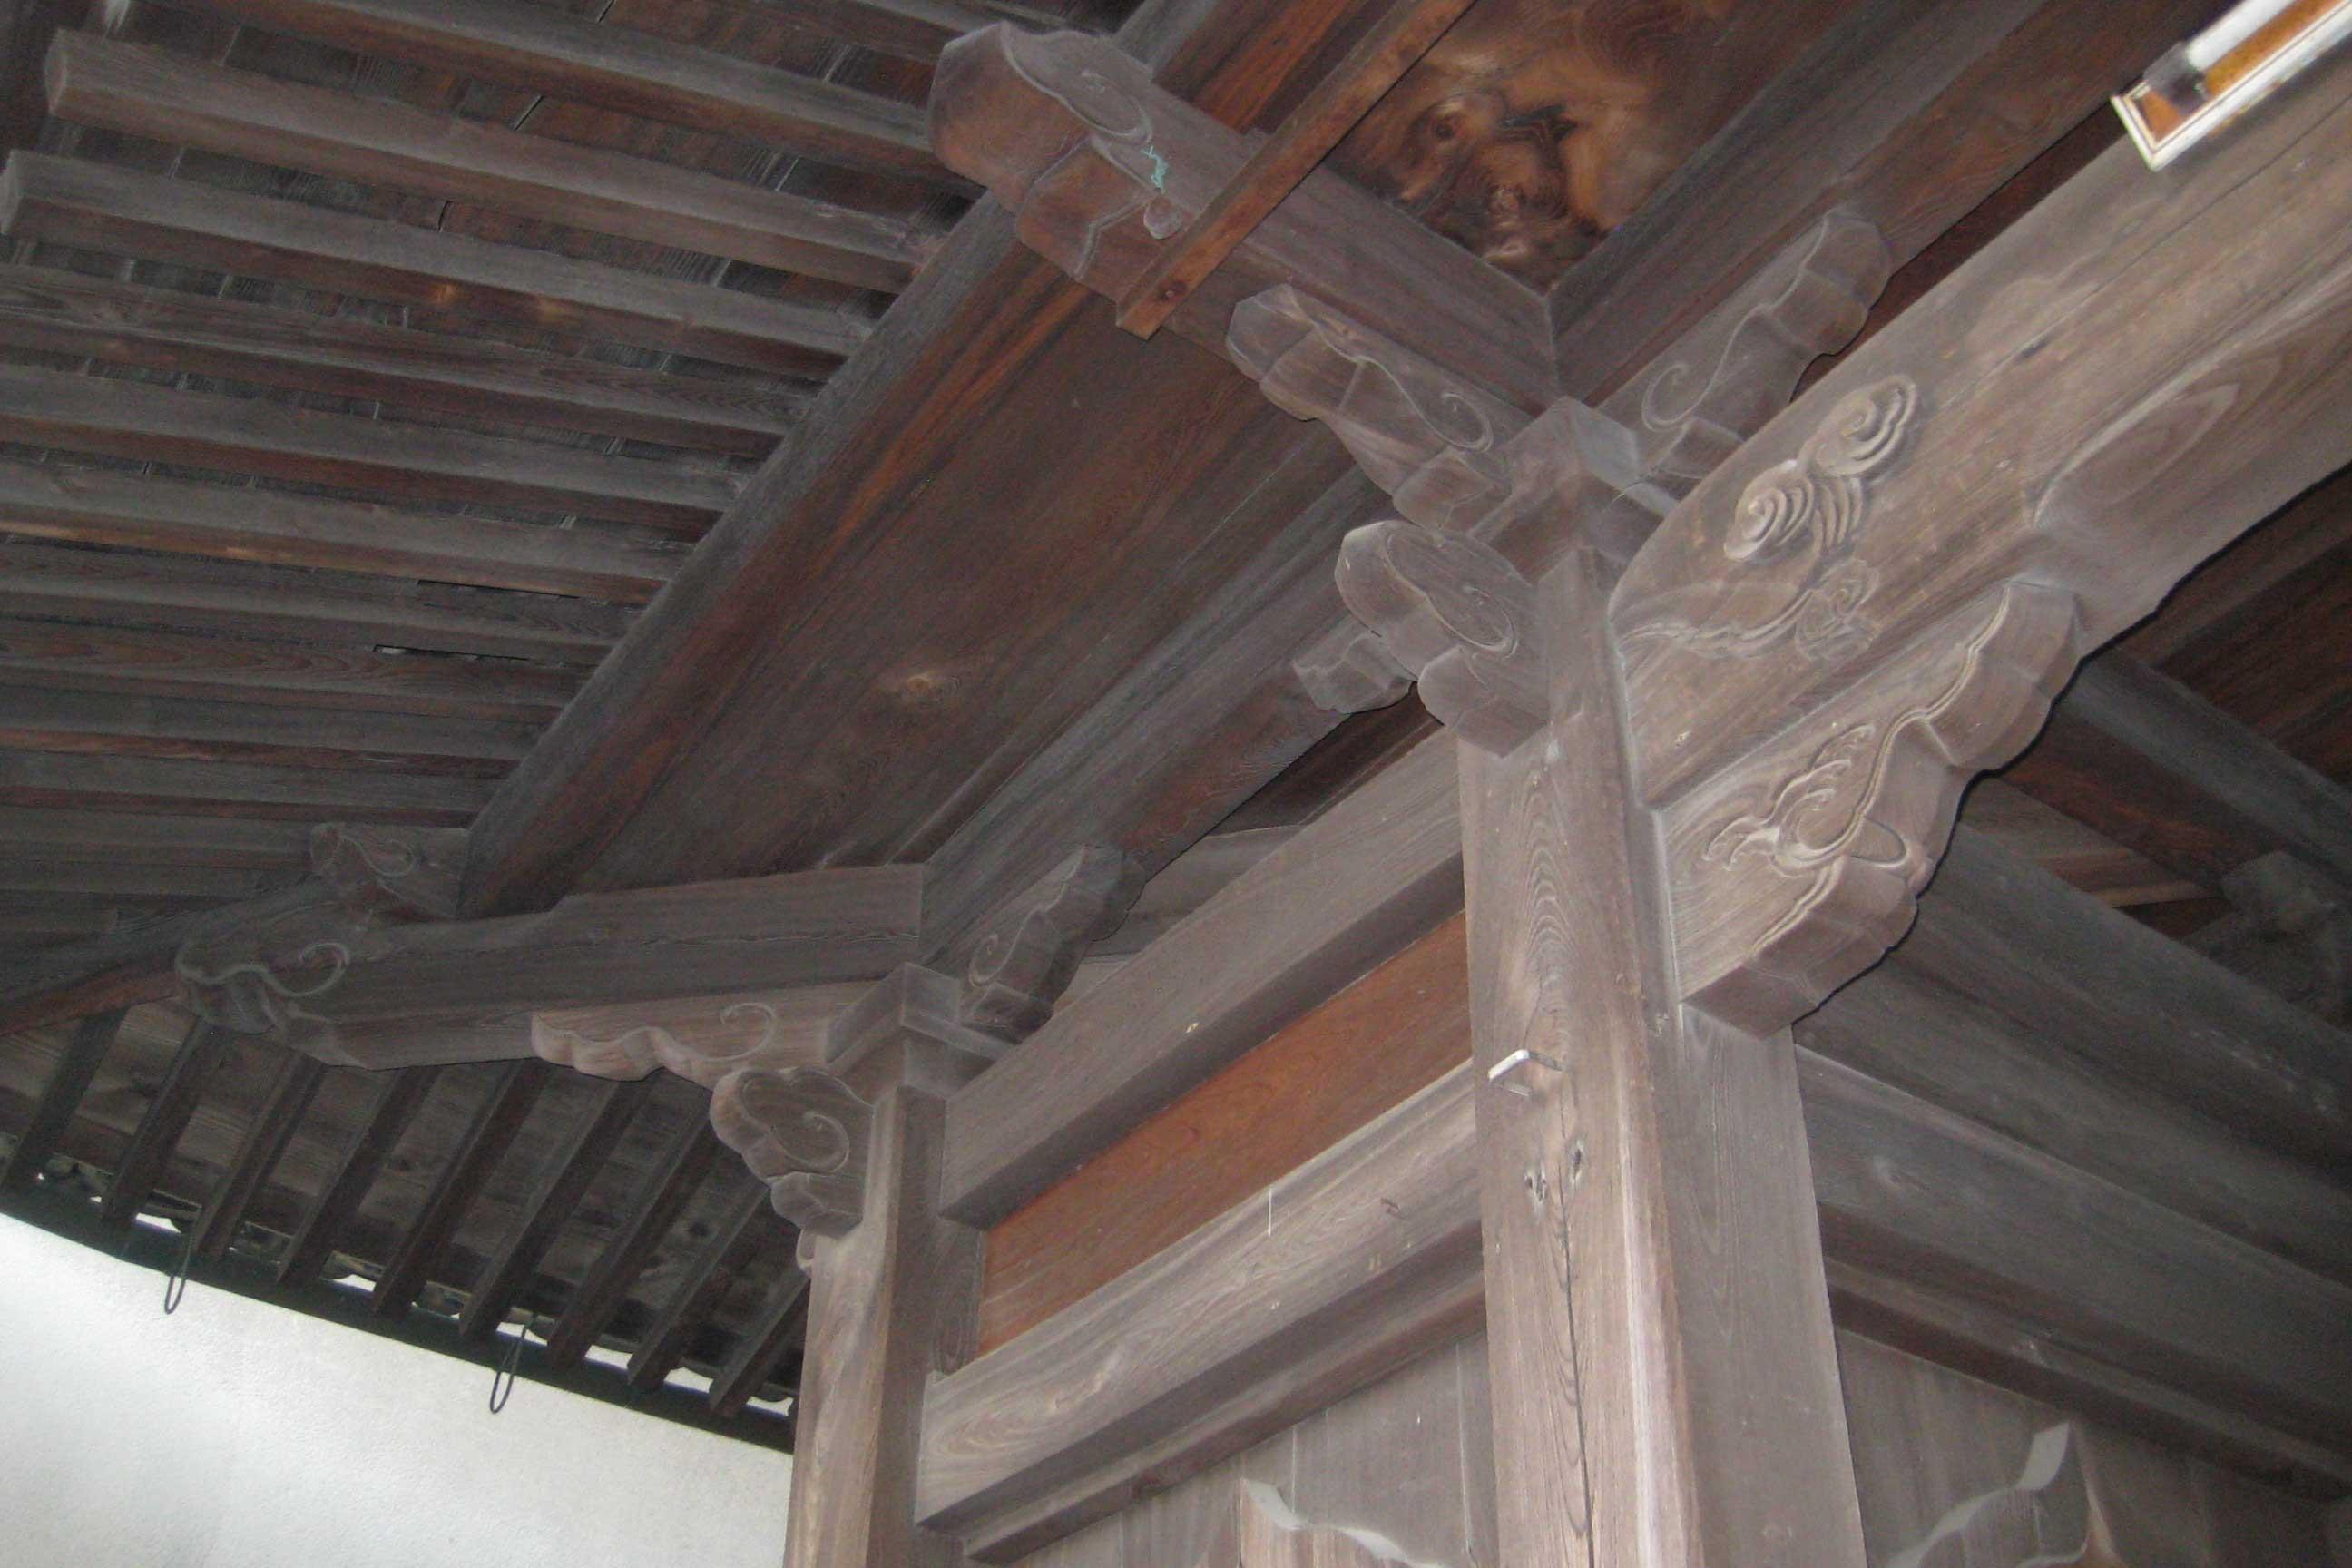 <p>神門 斗栱</p>初重為大斗肘木,出桁造(桁架出跳),単檐密椽。上重為平三斗(一斗三升)双檐扇形椽。